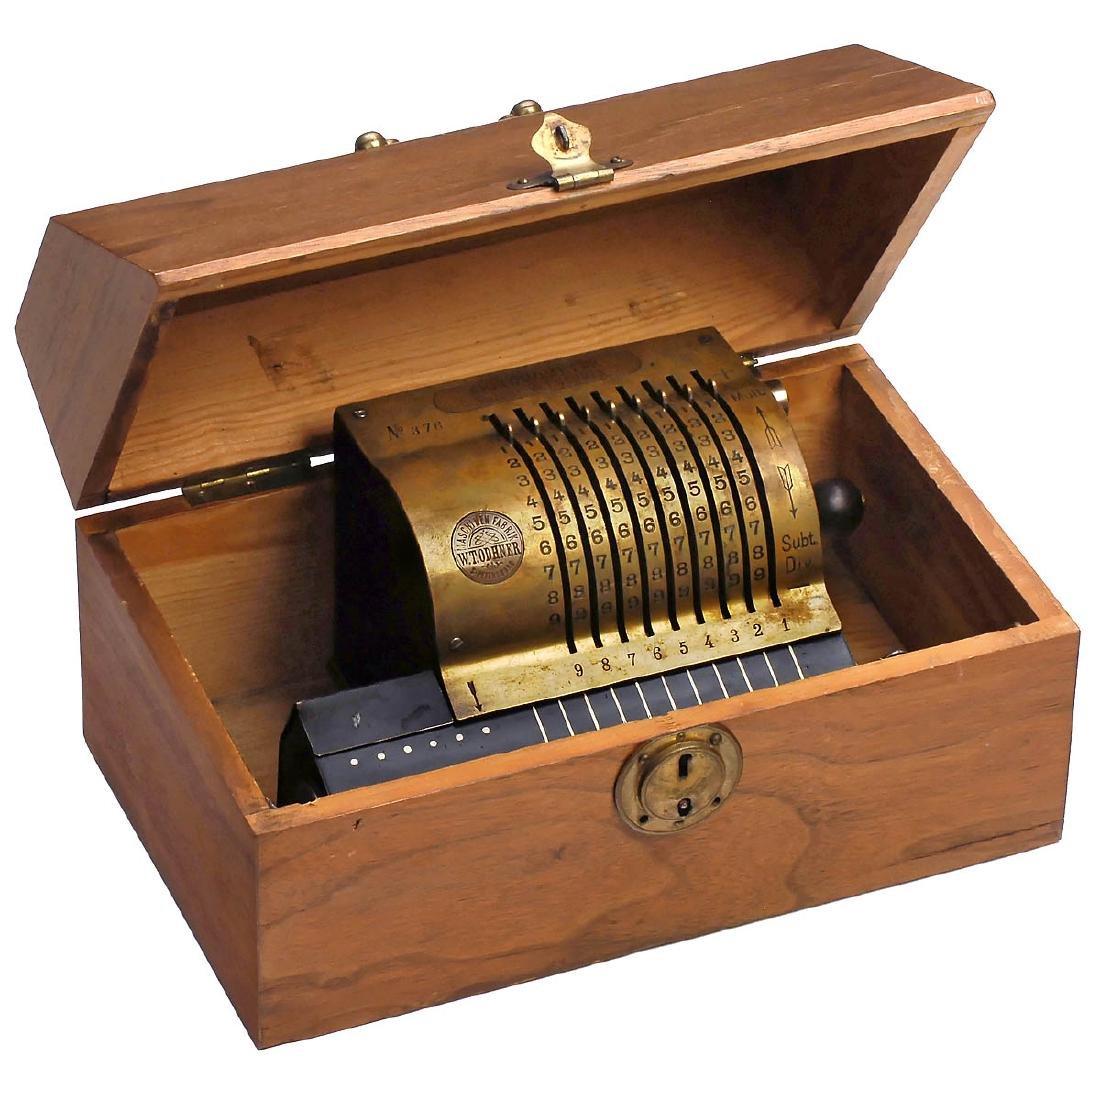 Russian Original Odhner Mod. 1 (Arithmometer), 1886 (!) - 2